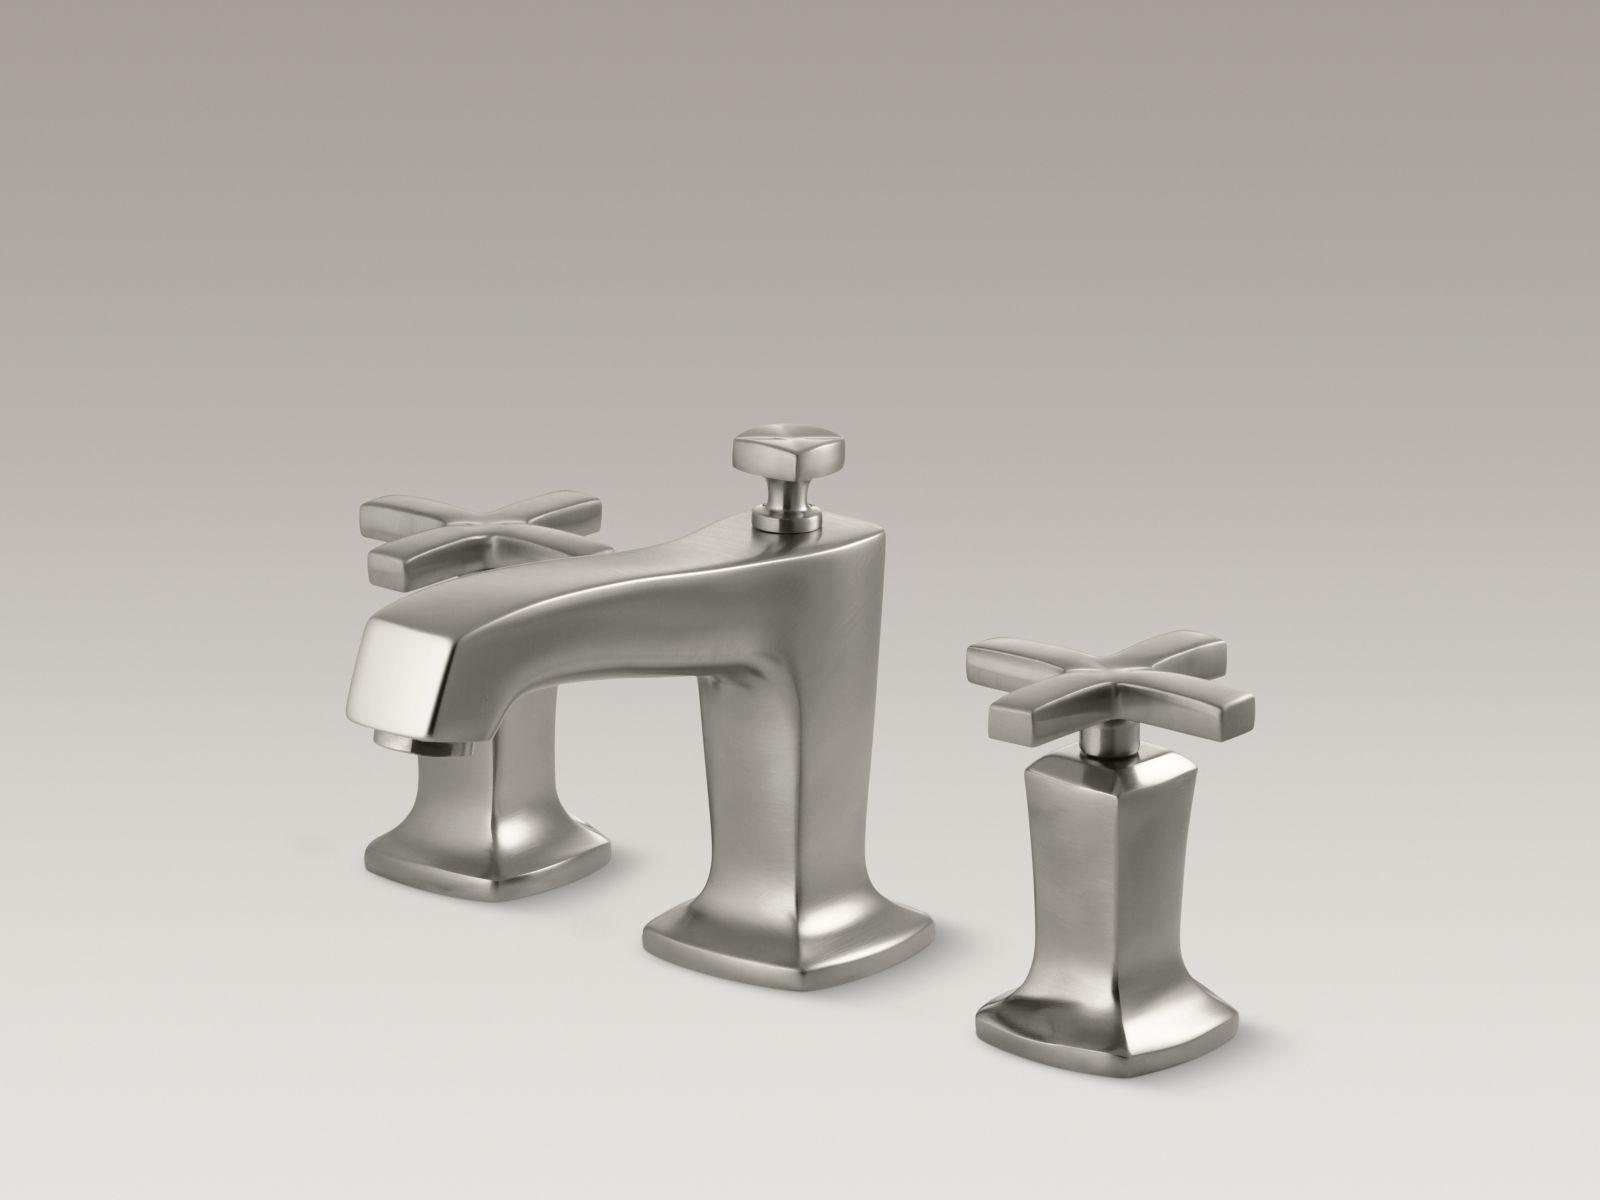 wide spread faucet part 16232 3 bn